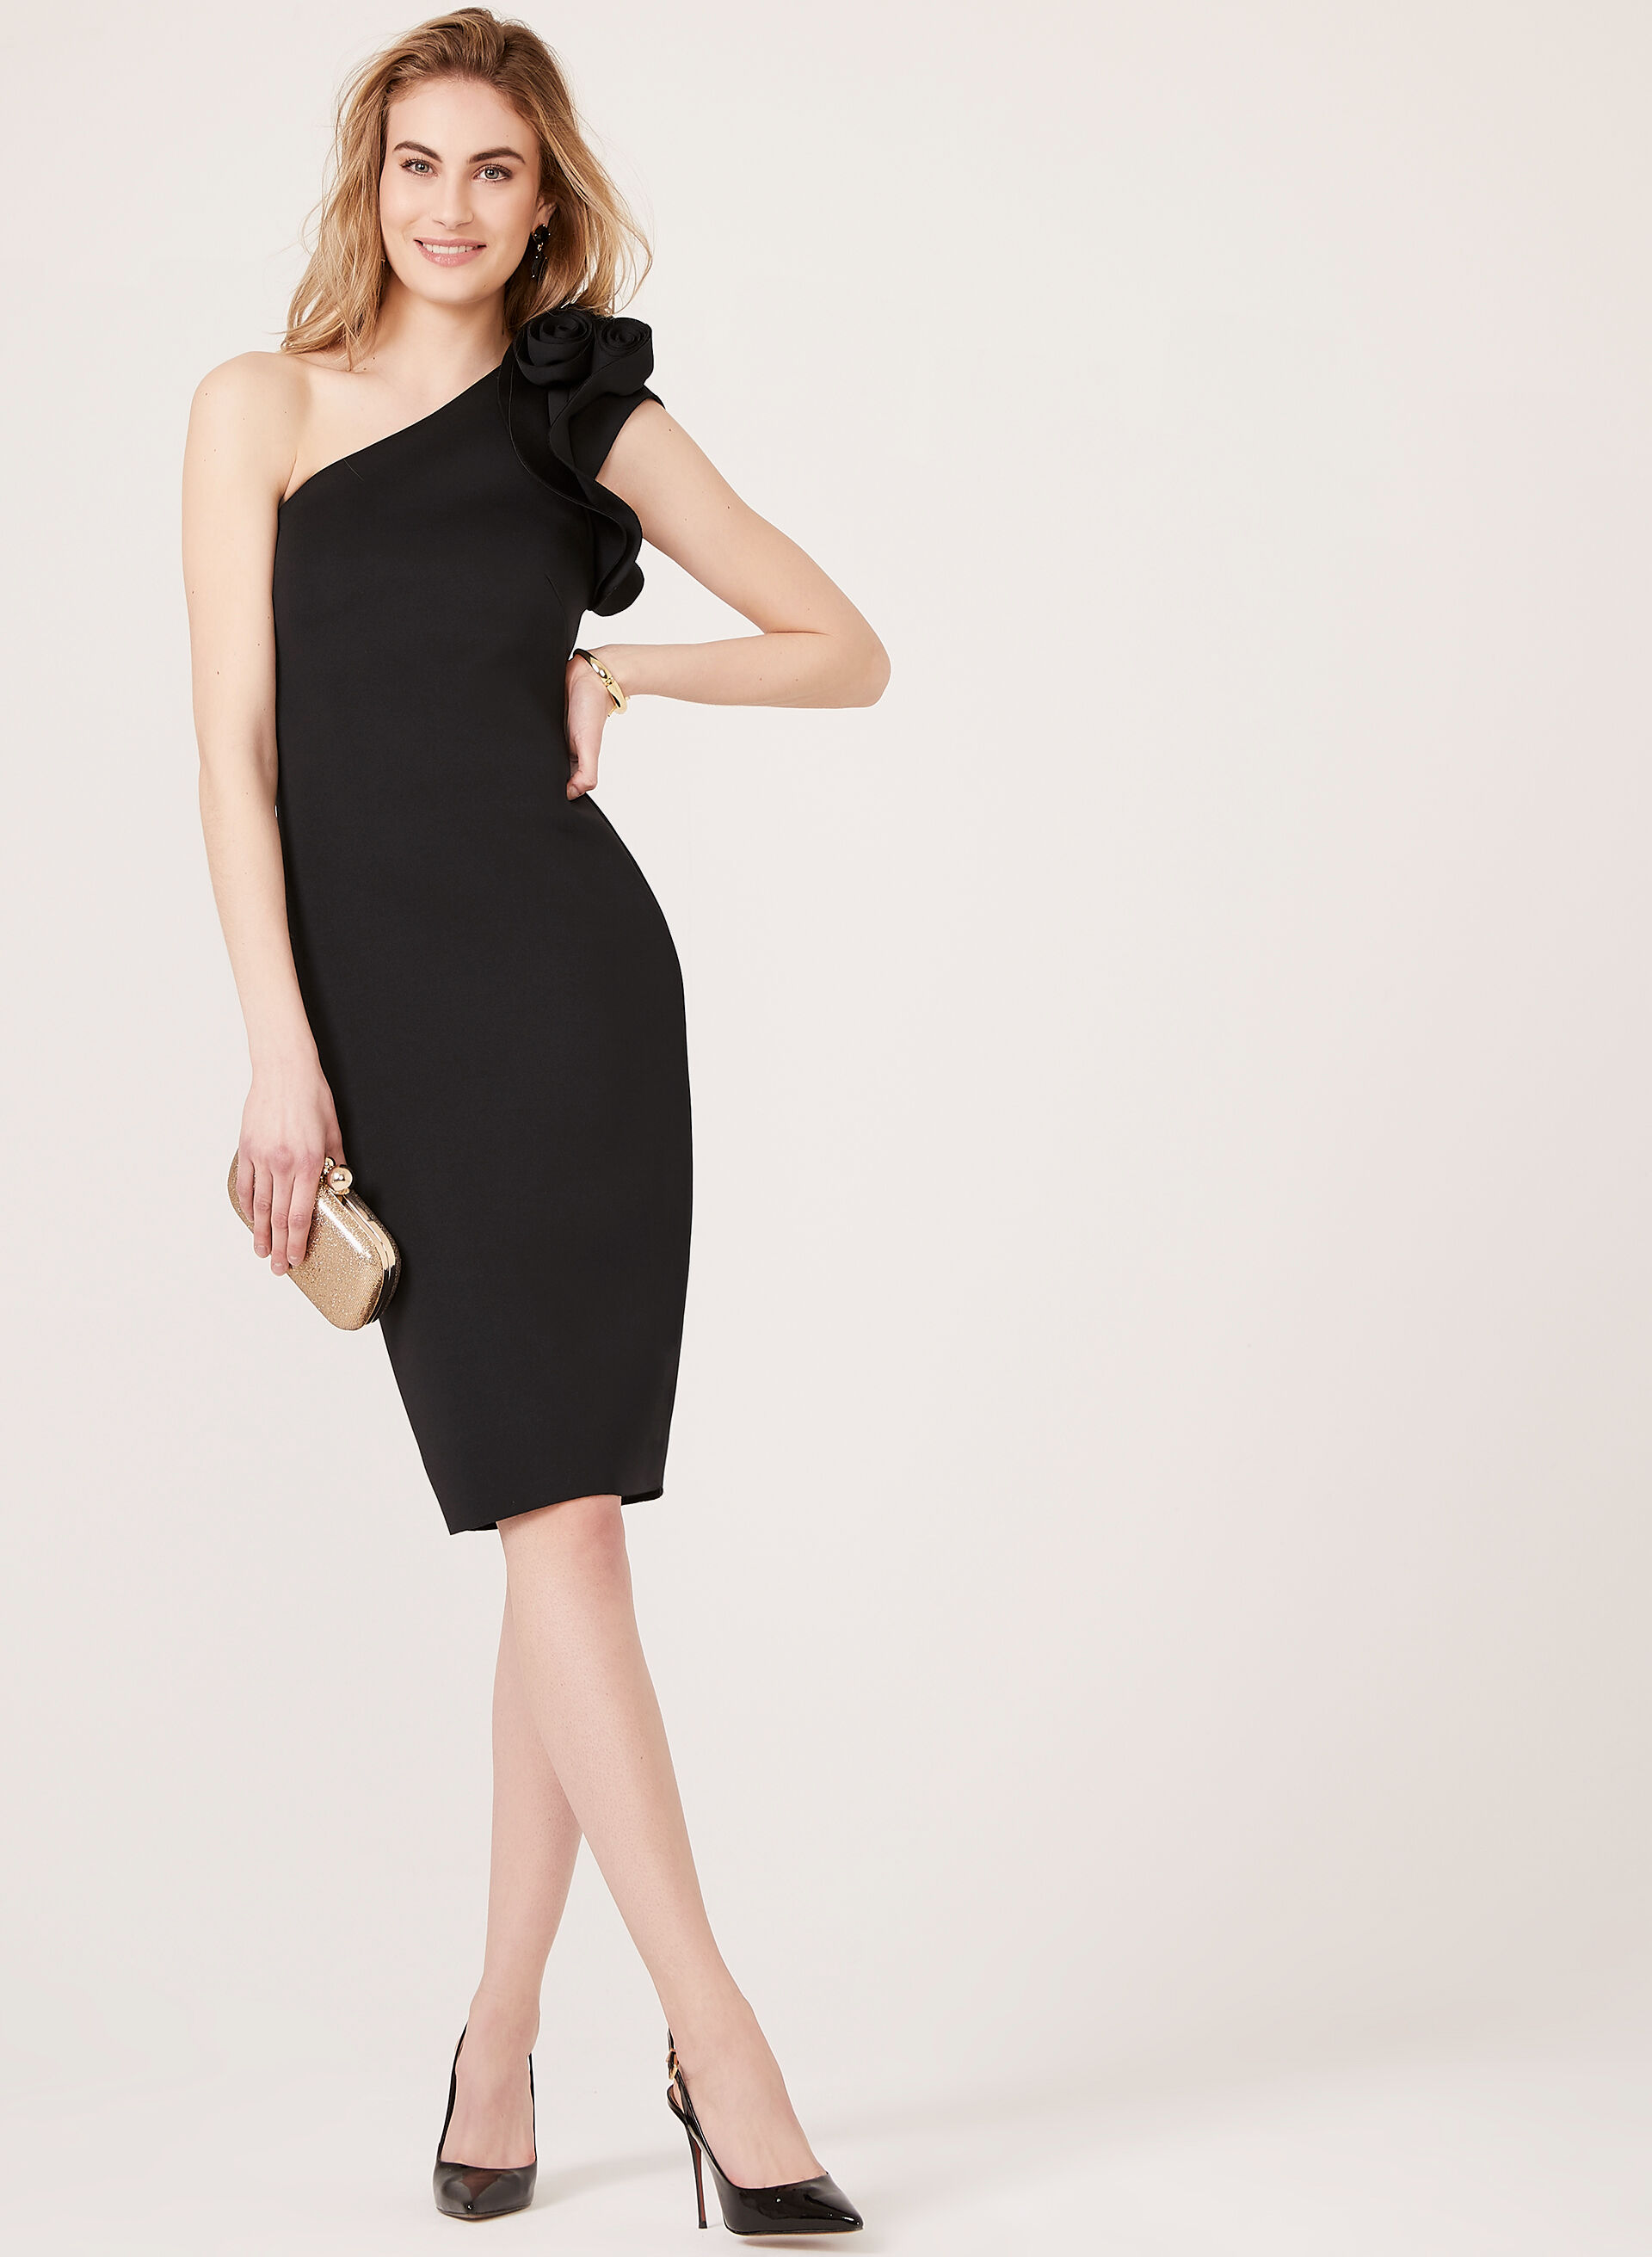 black dress cocktail dress